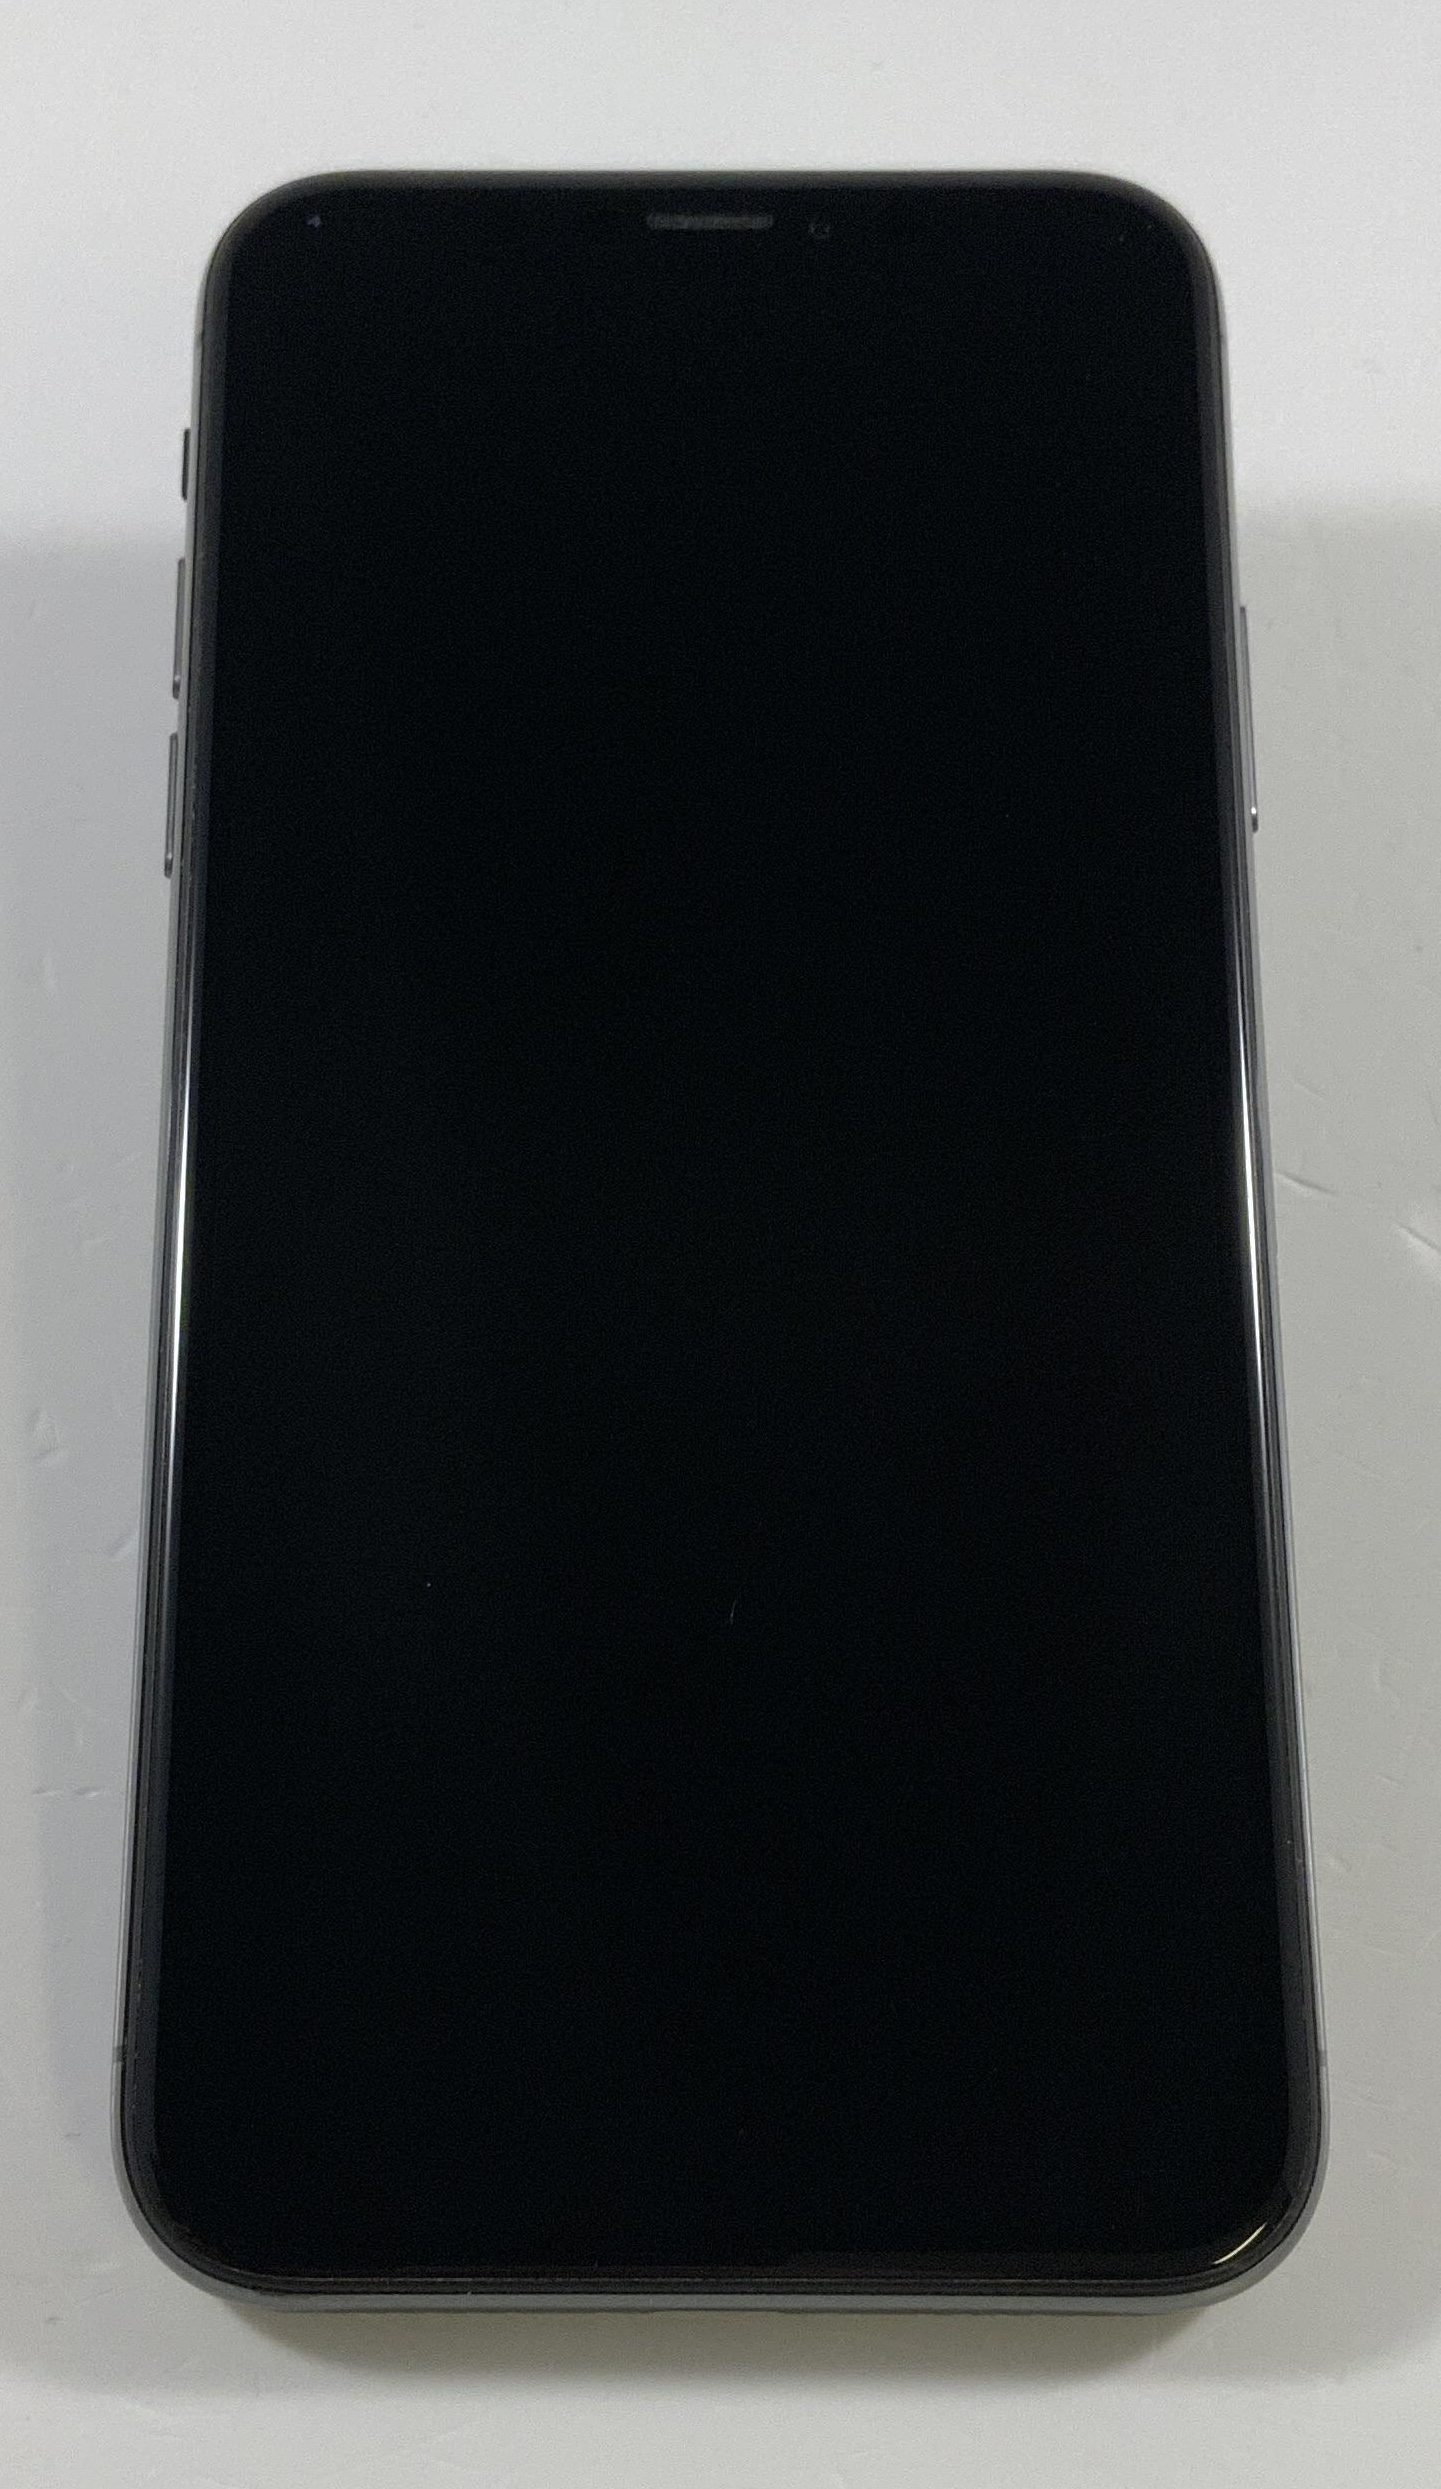 iPhone X 64GB, 64GB, Space Gray, obraz 1